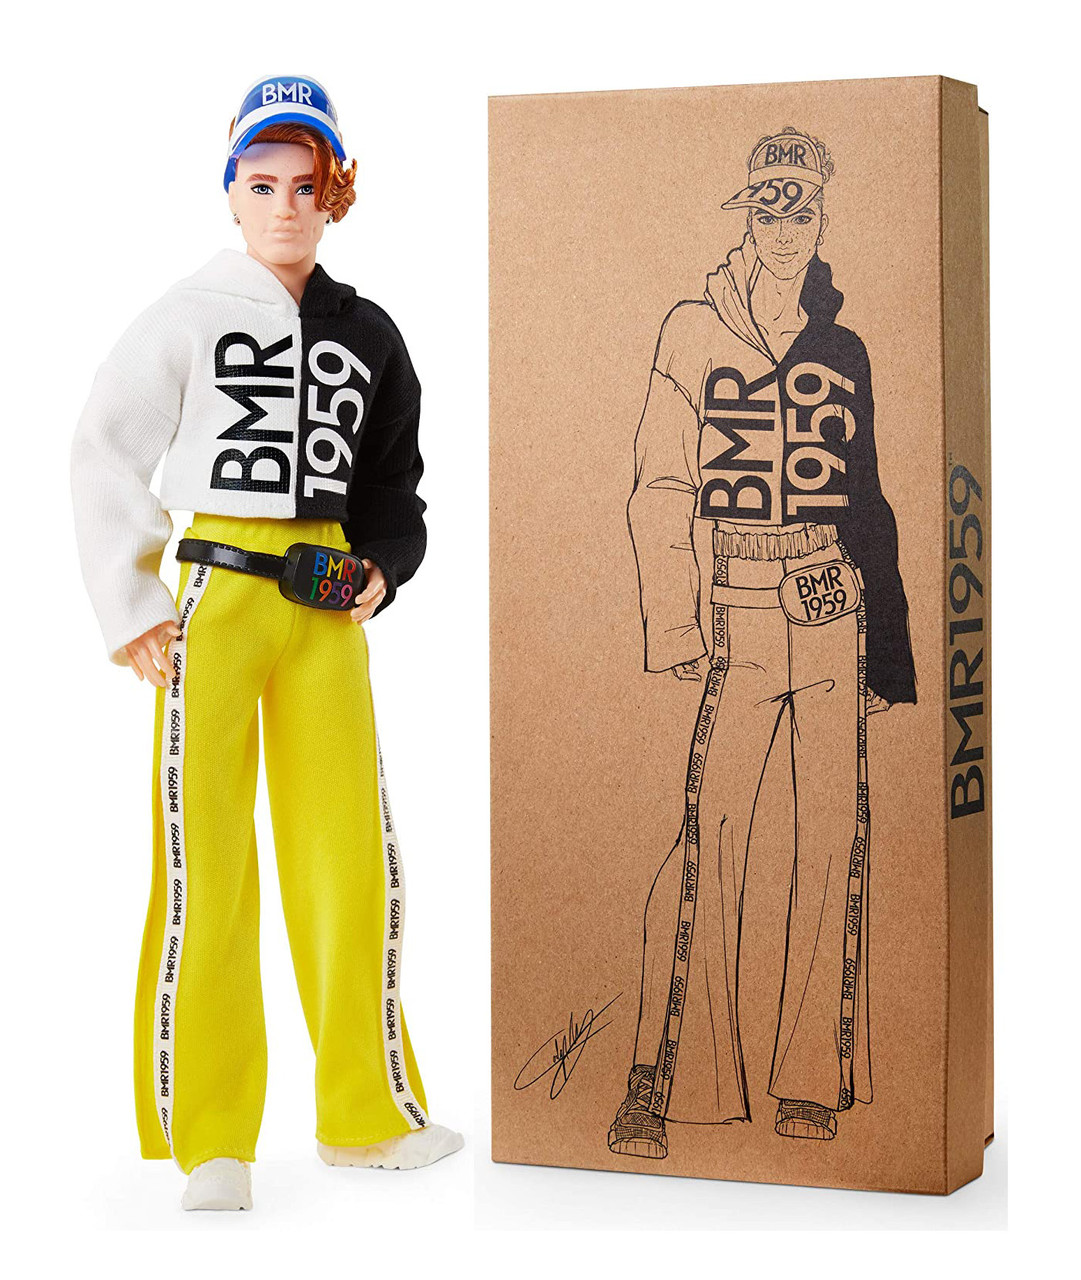 Кукла Барби Кен  Barbie BMR1959 Hoodie, Track Pants & Visor Fashion Doll оригинал от Mattel